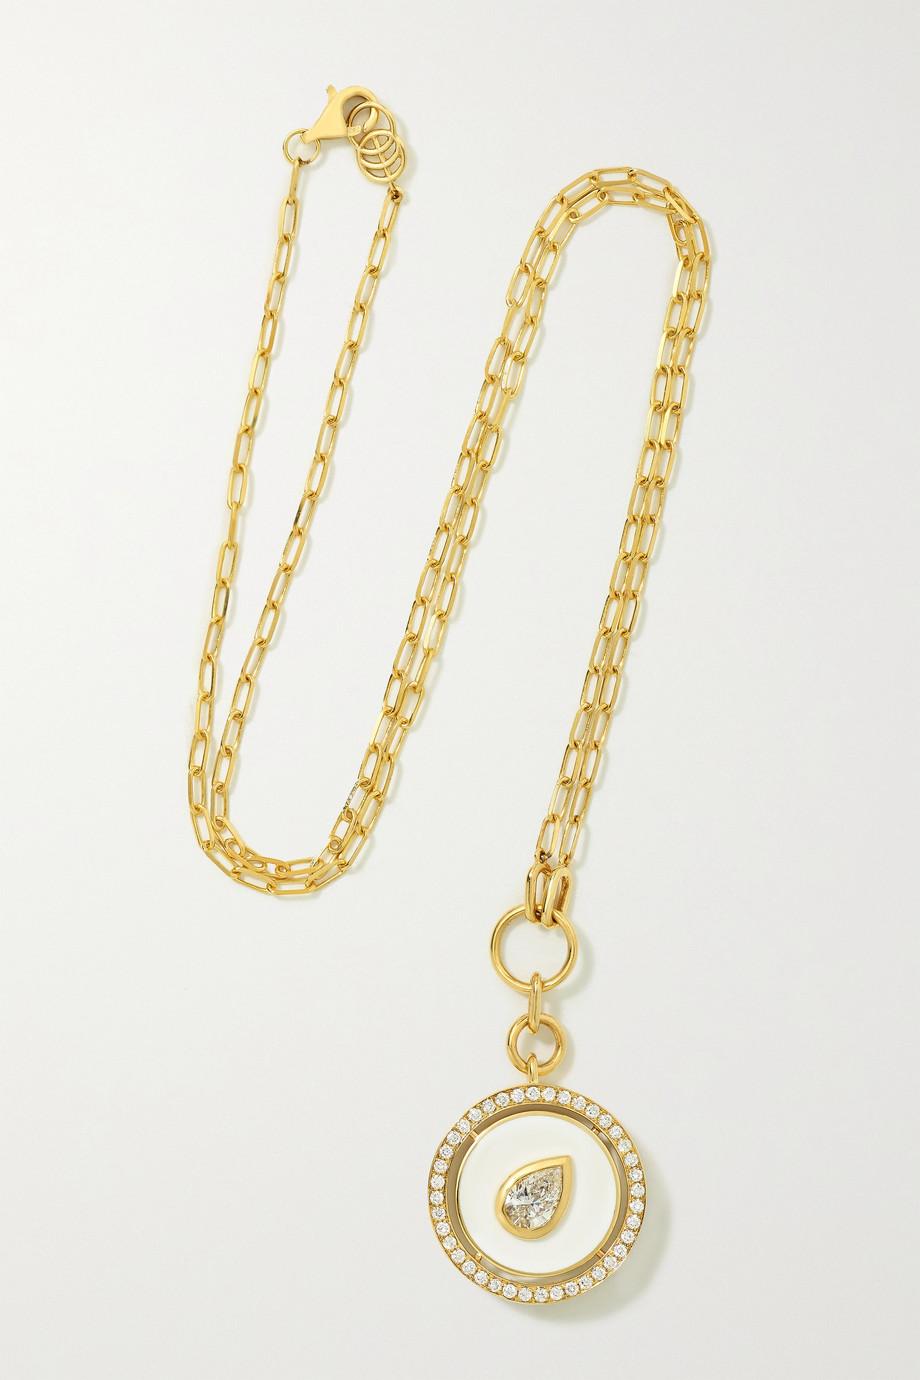 State Property Aebi 18-karat gold, enamel and diamond necklace